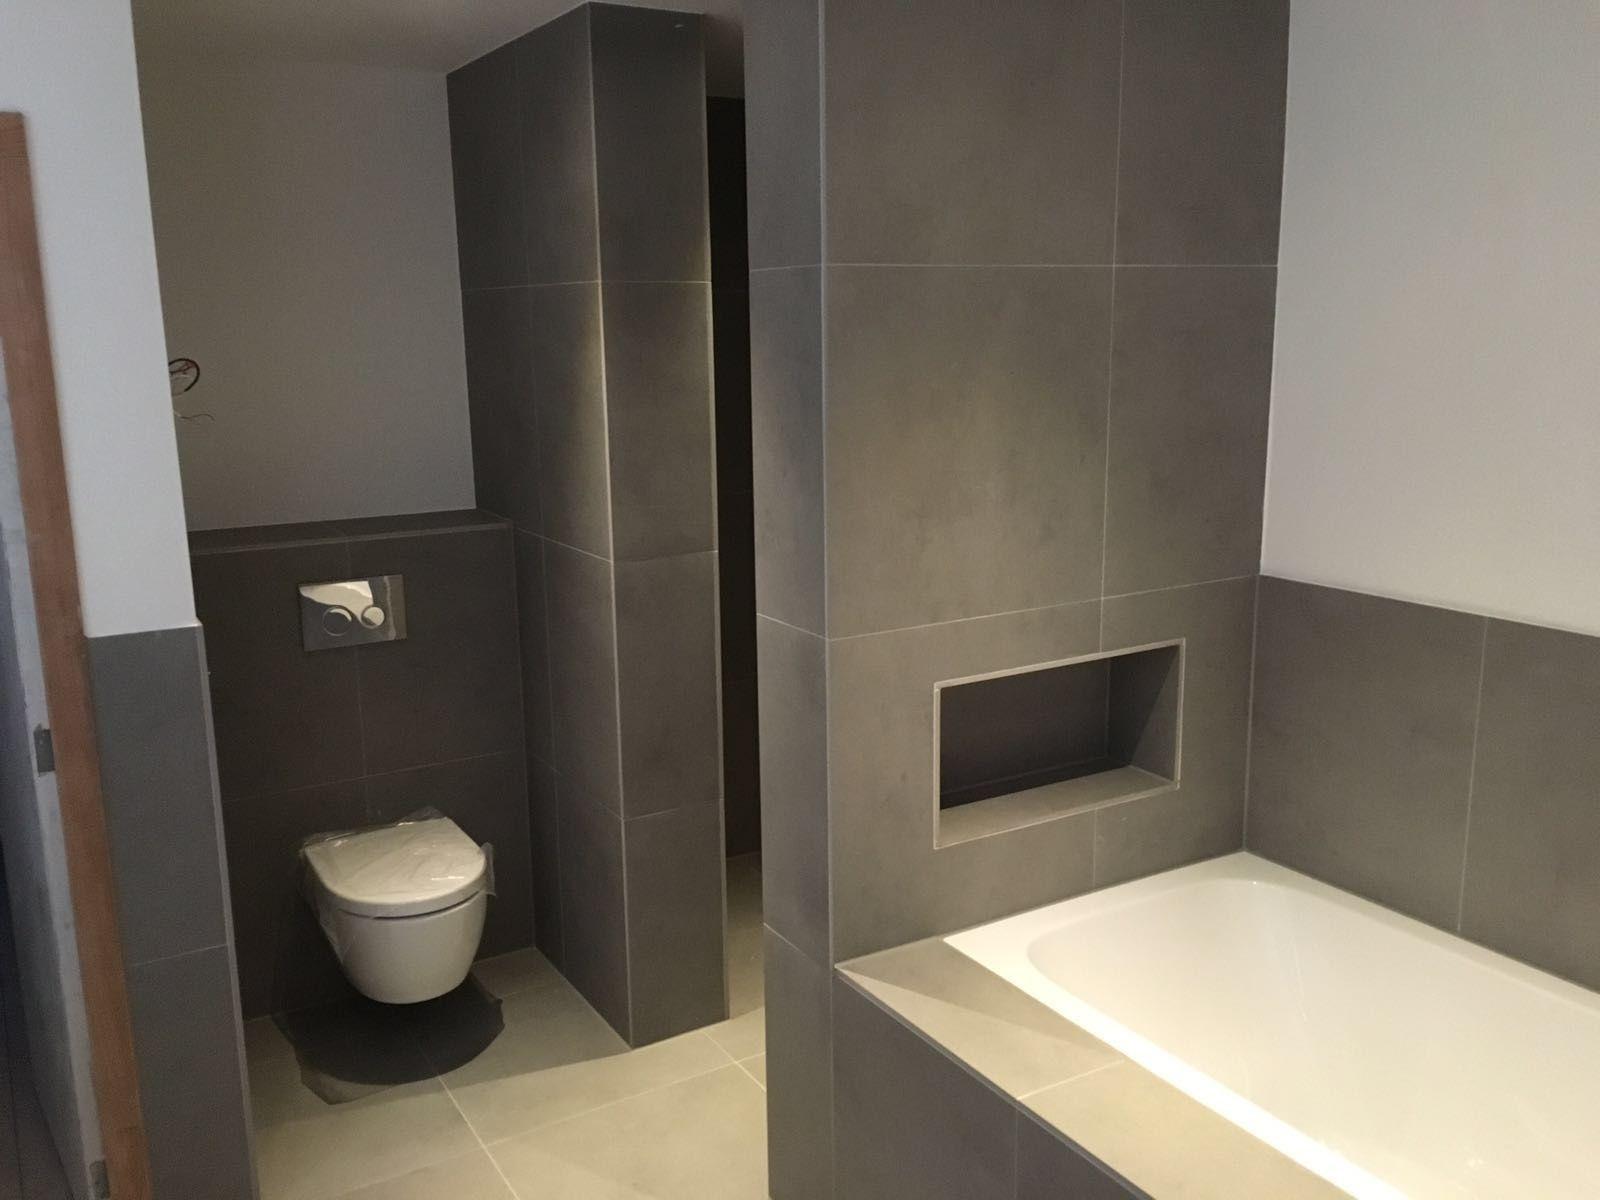 Betonlook Tegels Badkamer : Terratinta betontech grey betonlook tegels in de badkamer